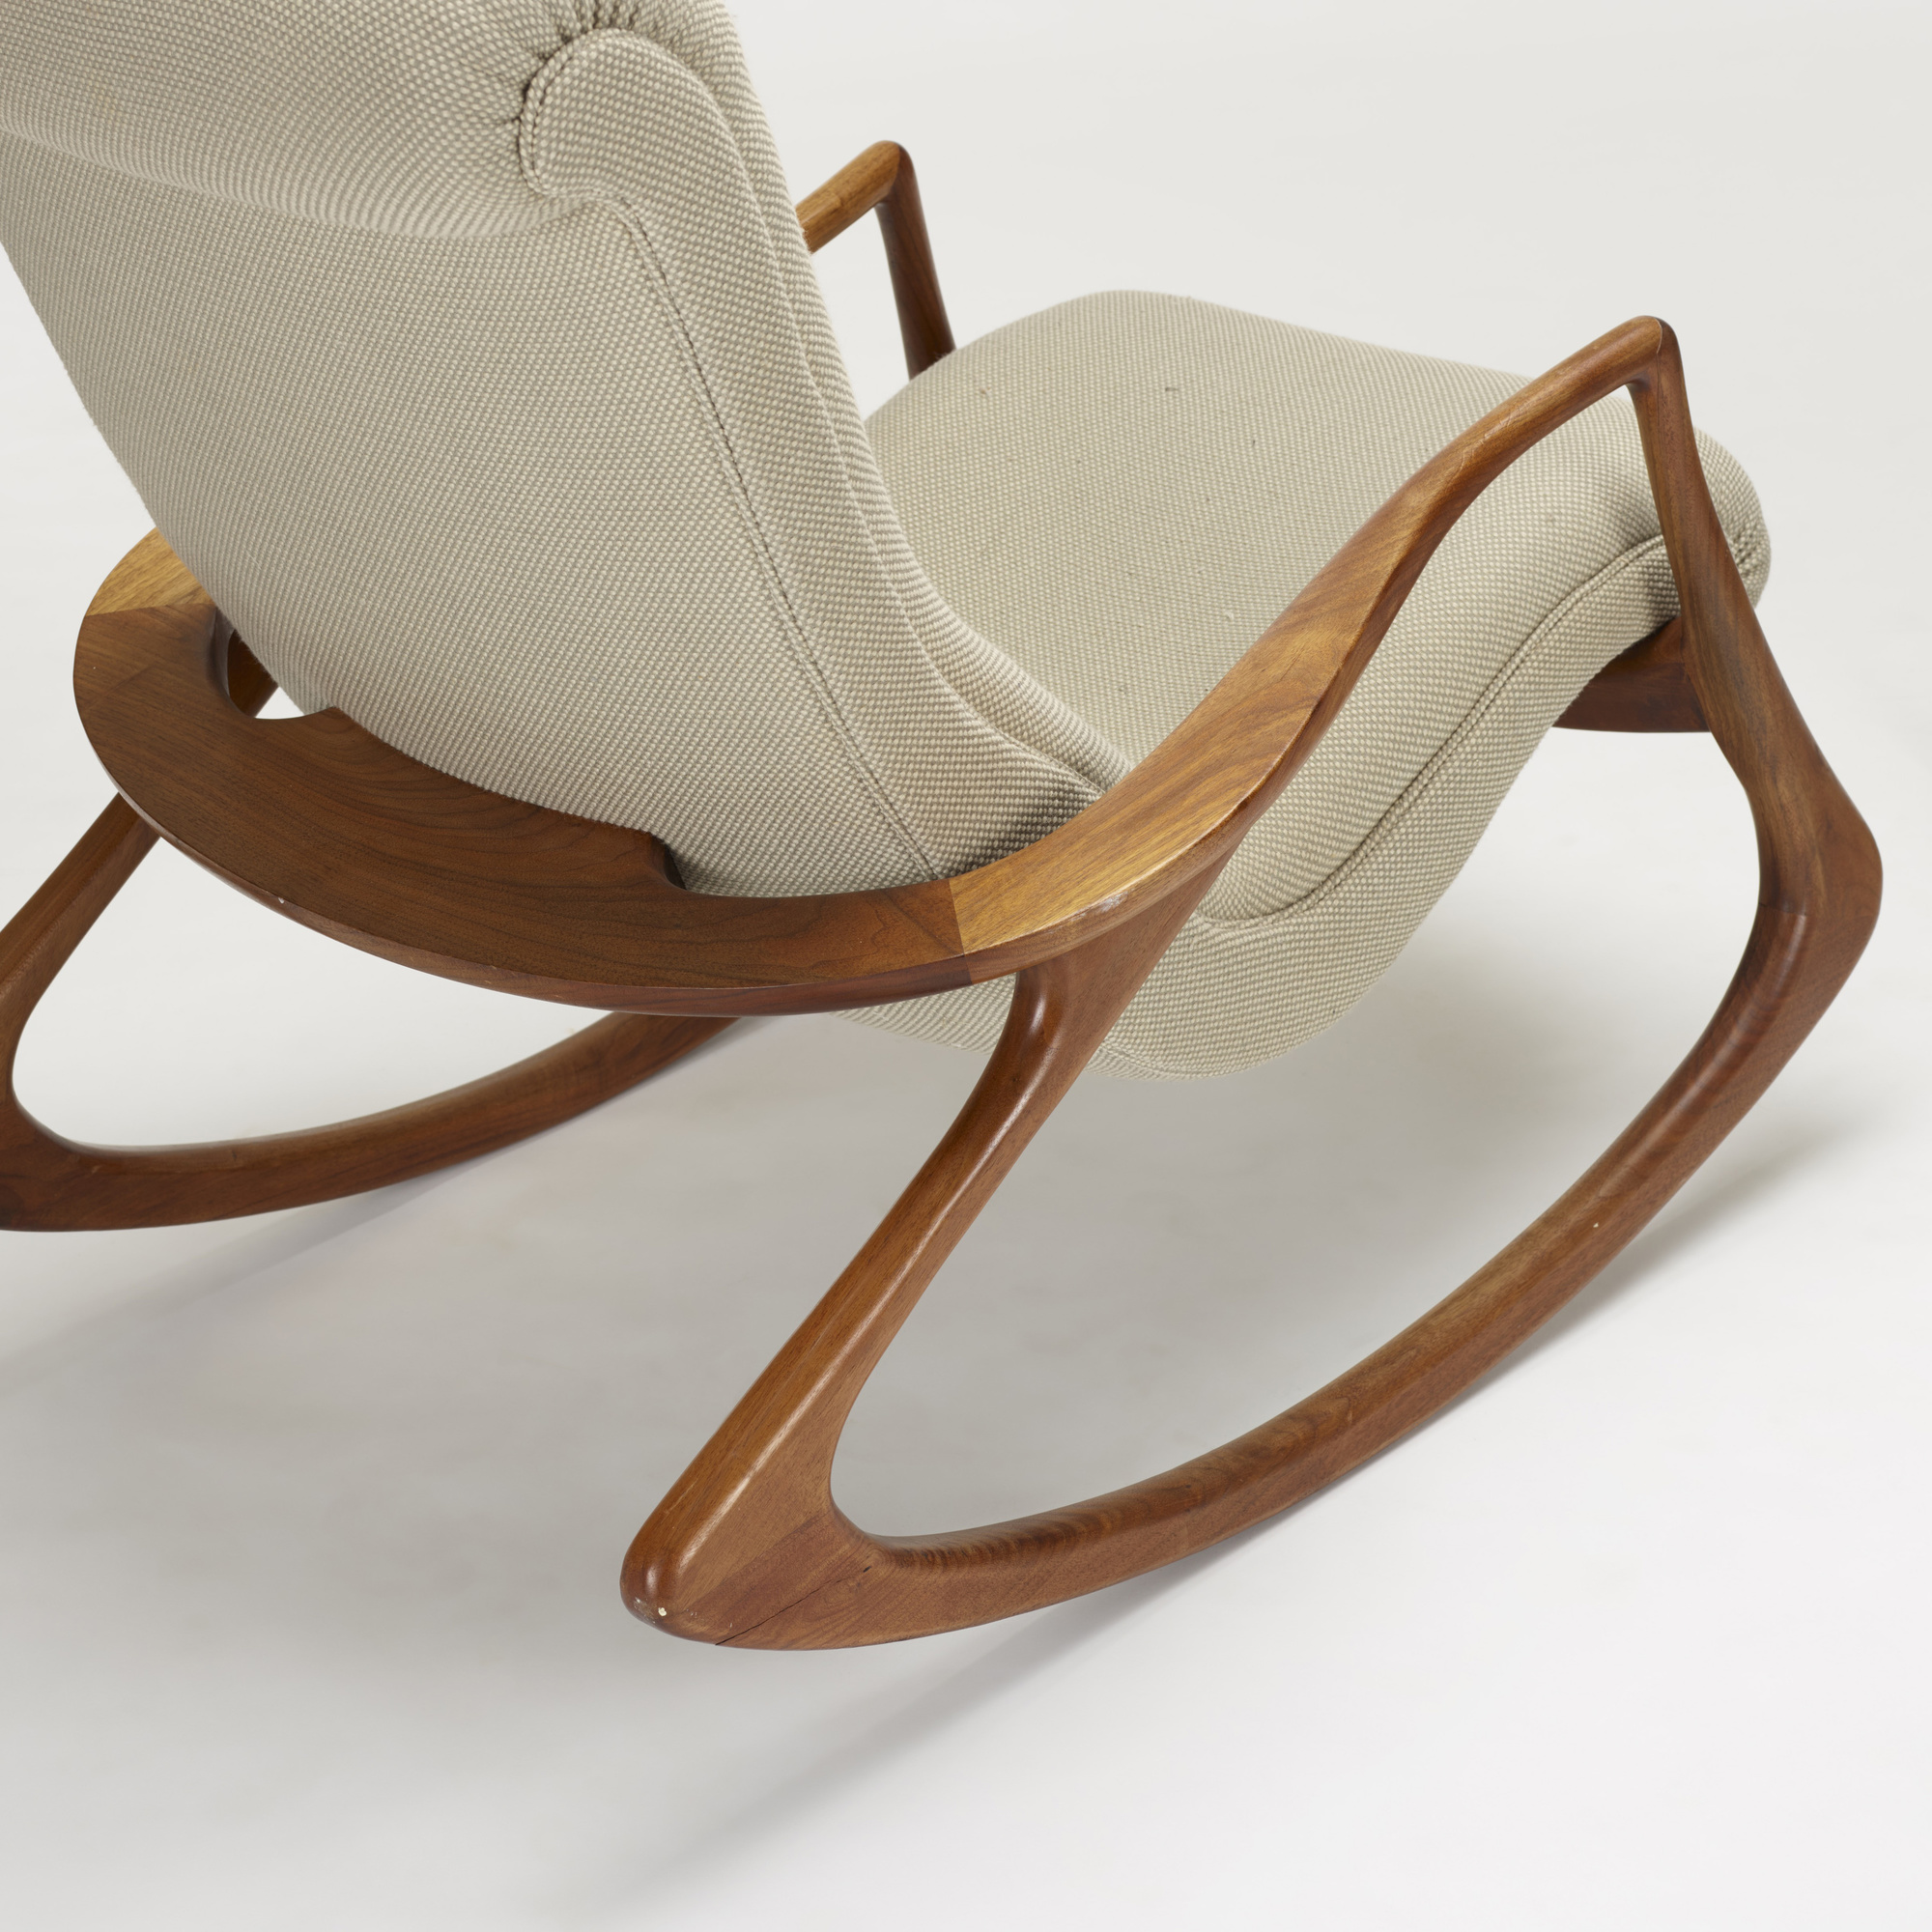 ... 240: Vladimir Kagan / Sculpted Rocking Chair And Ottoman (3 Of 3)